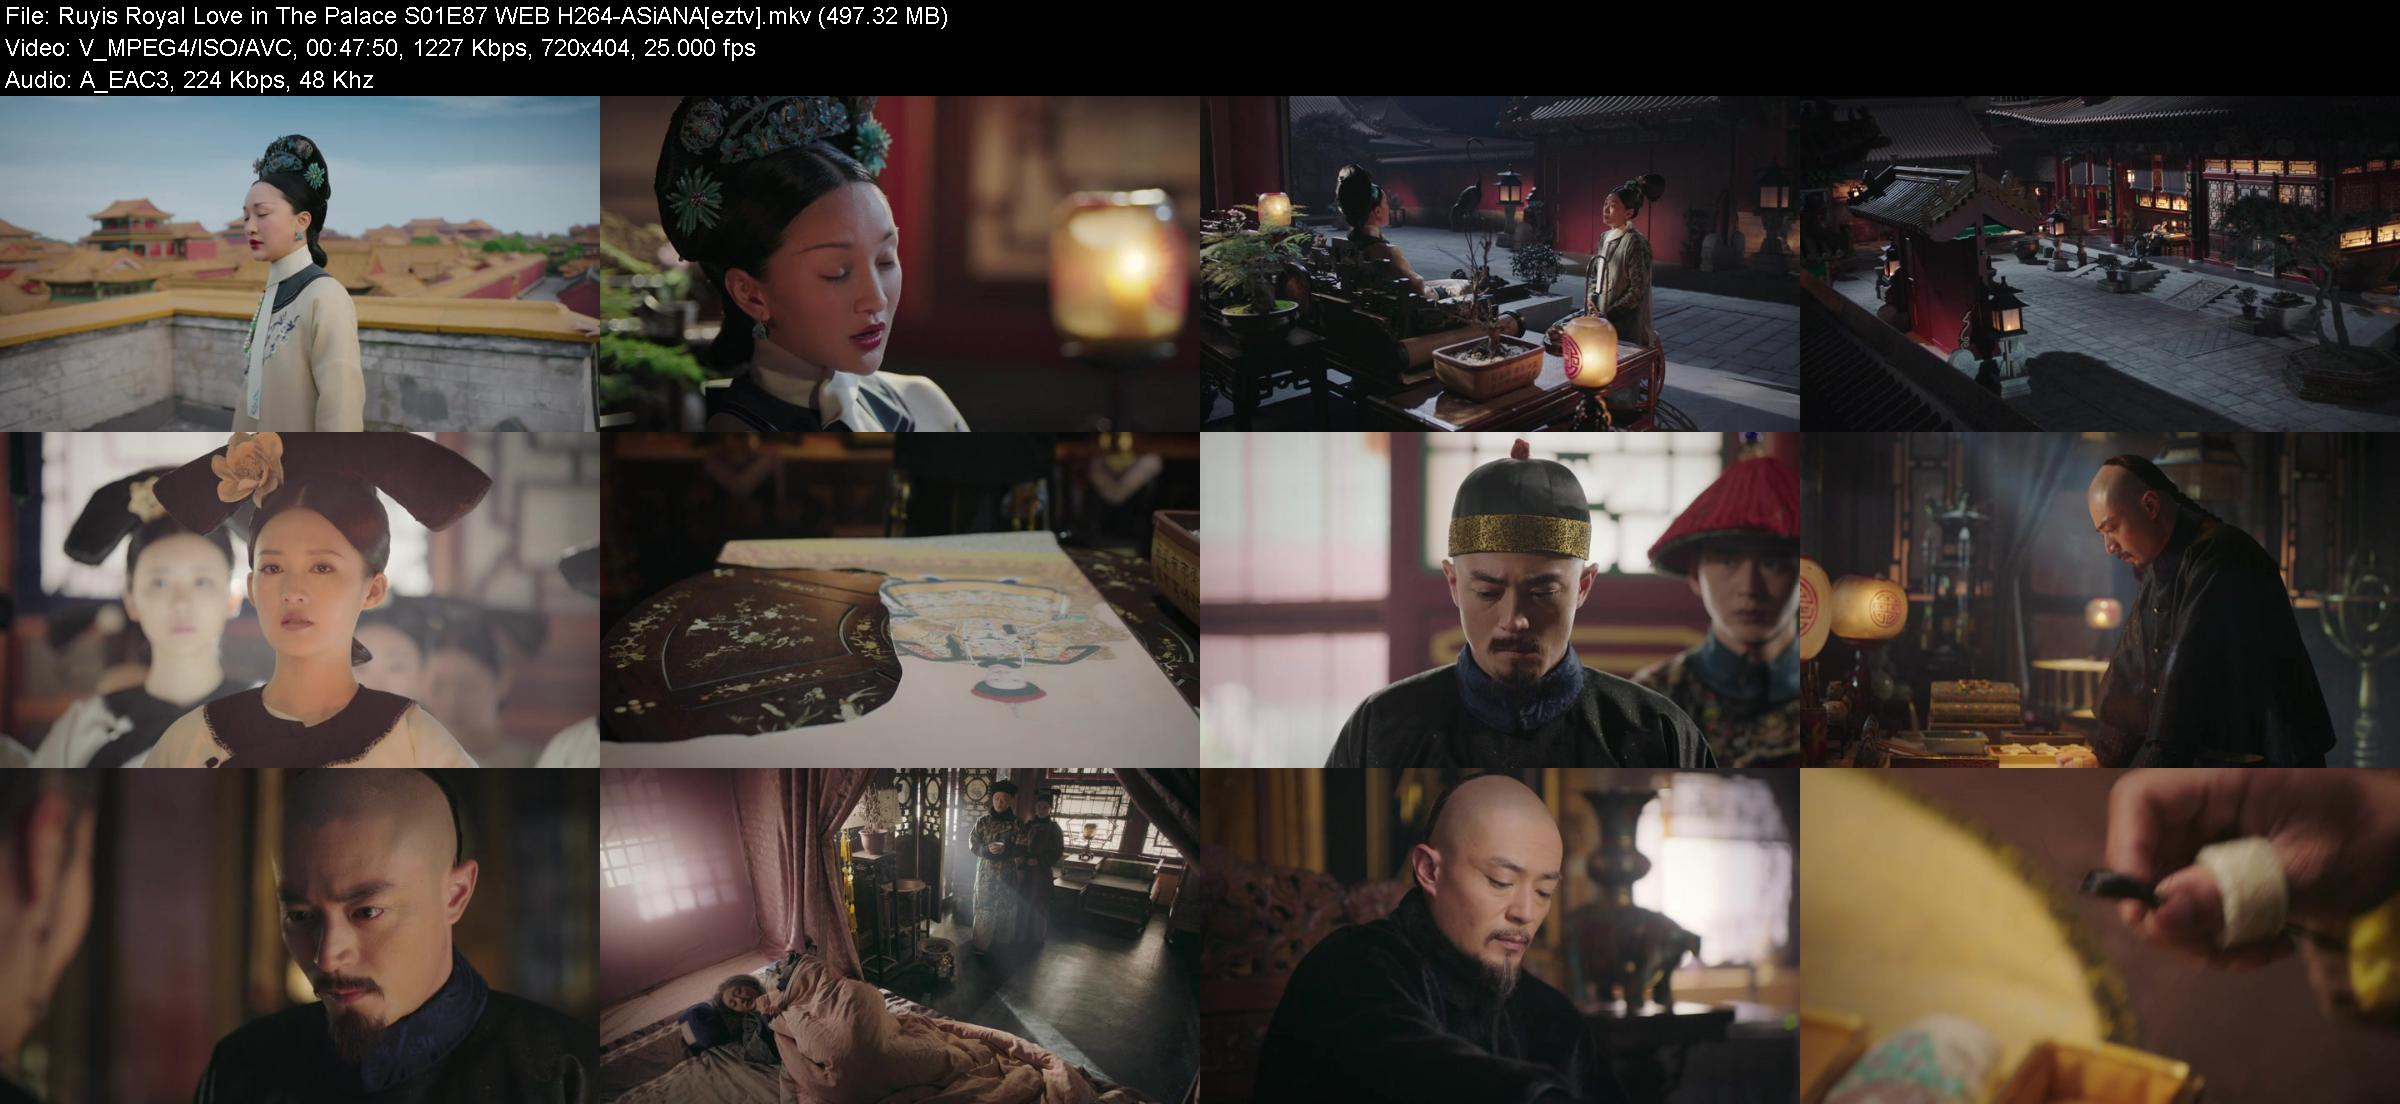 Ruyis Royal Love in The Palace S01E87 WEB H264-ASiANA